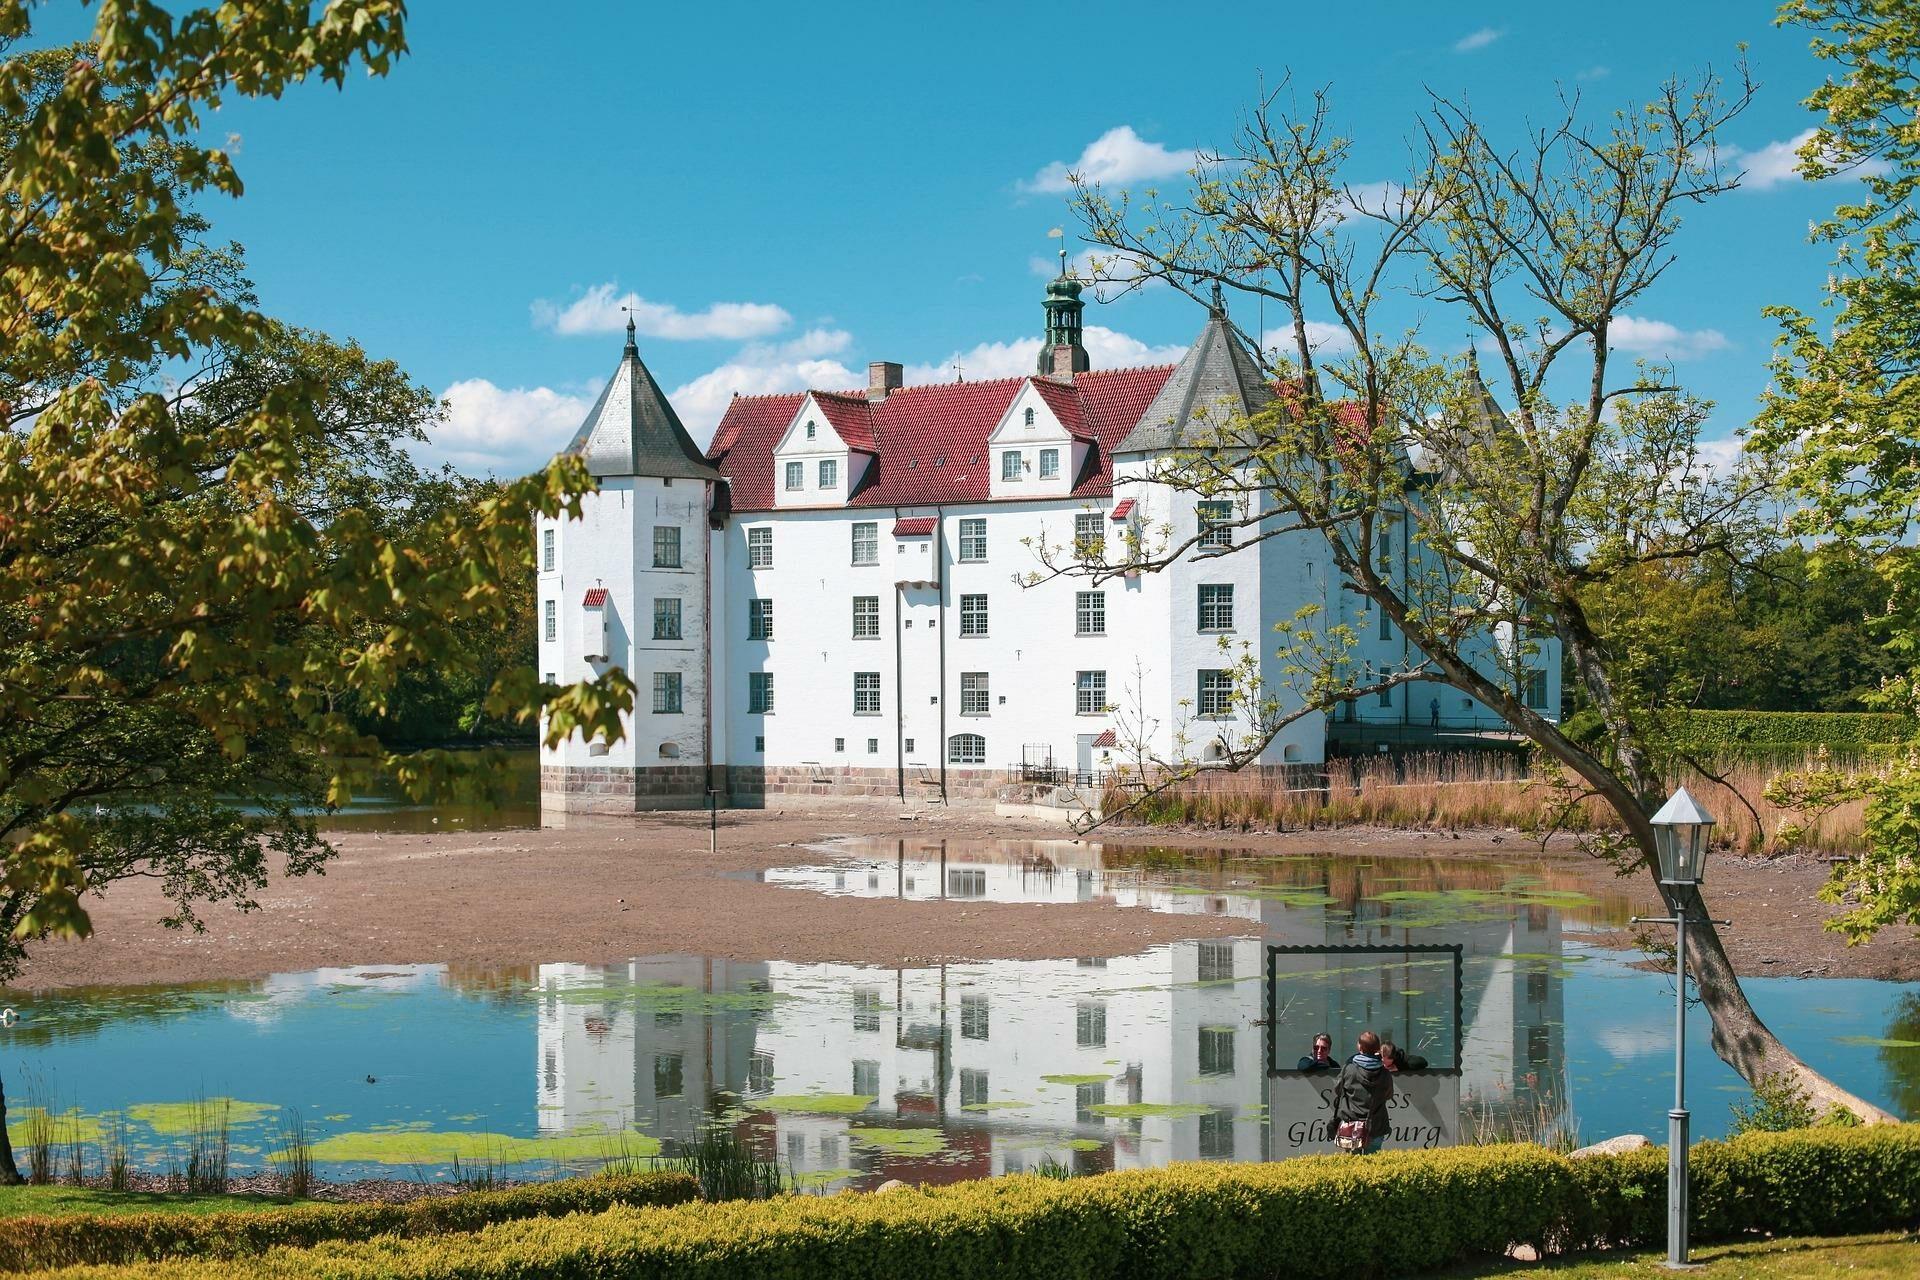 Wasserschloss in Glücksburg